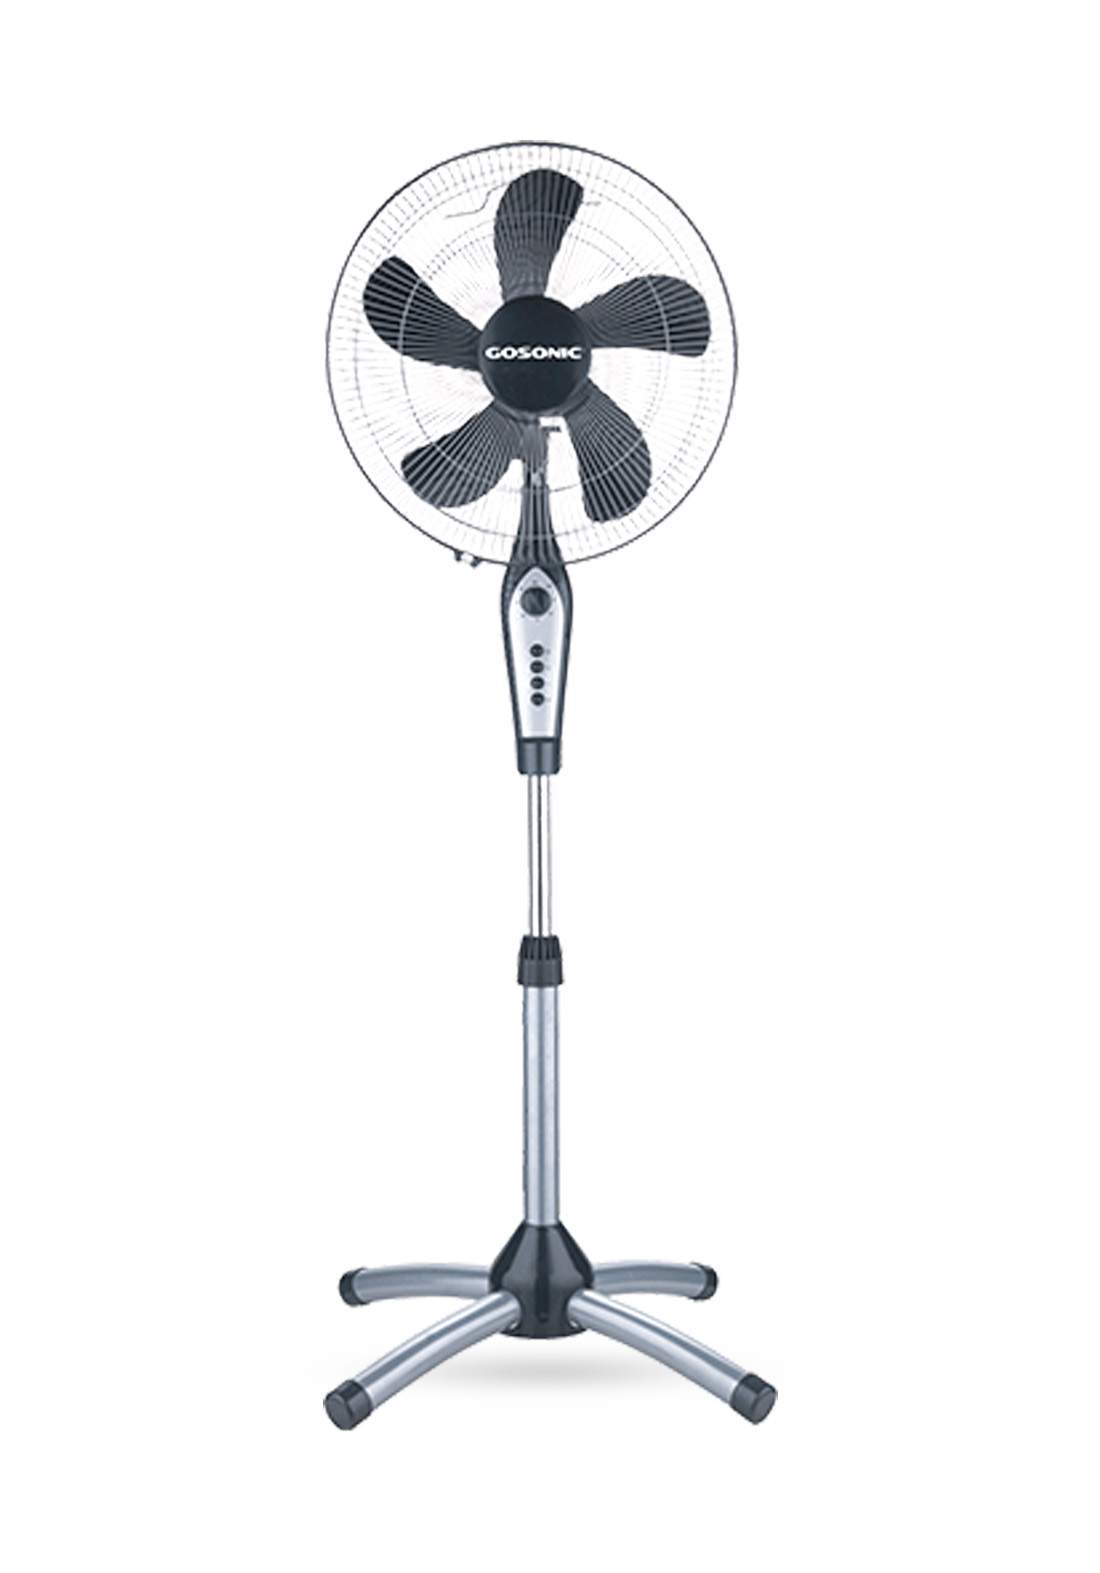 Gosonic 163 Vertical fan مروحة عامودية